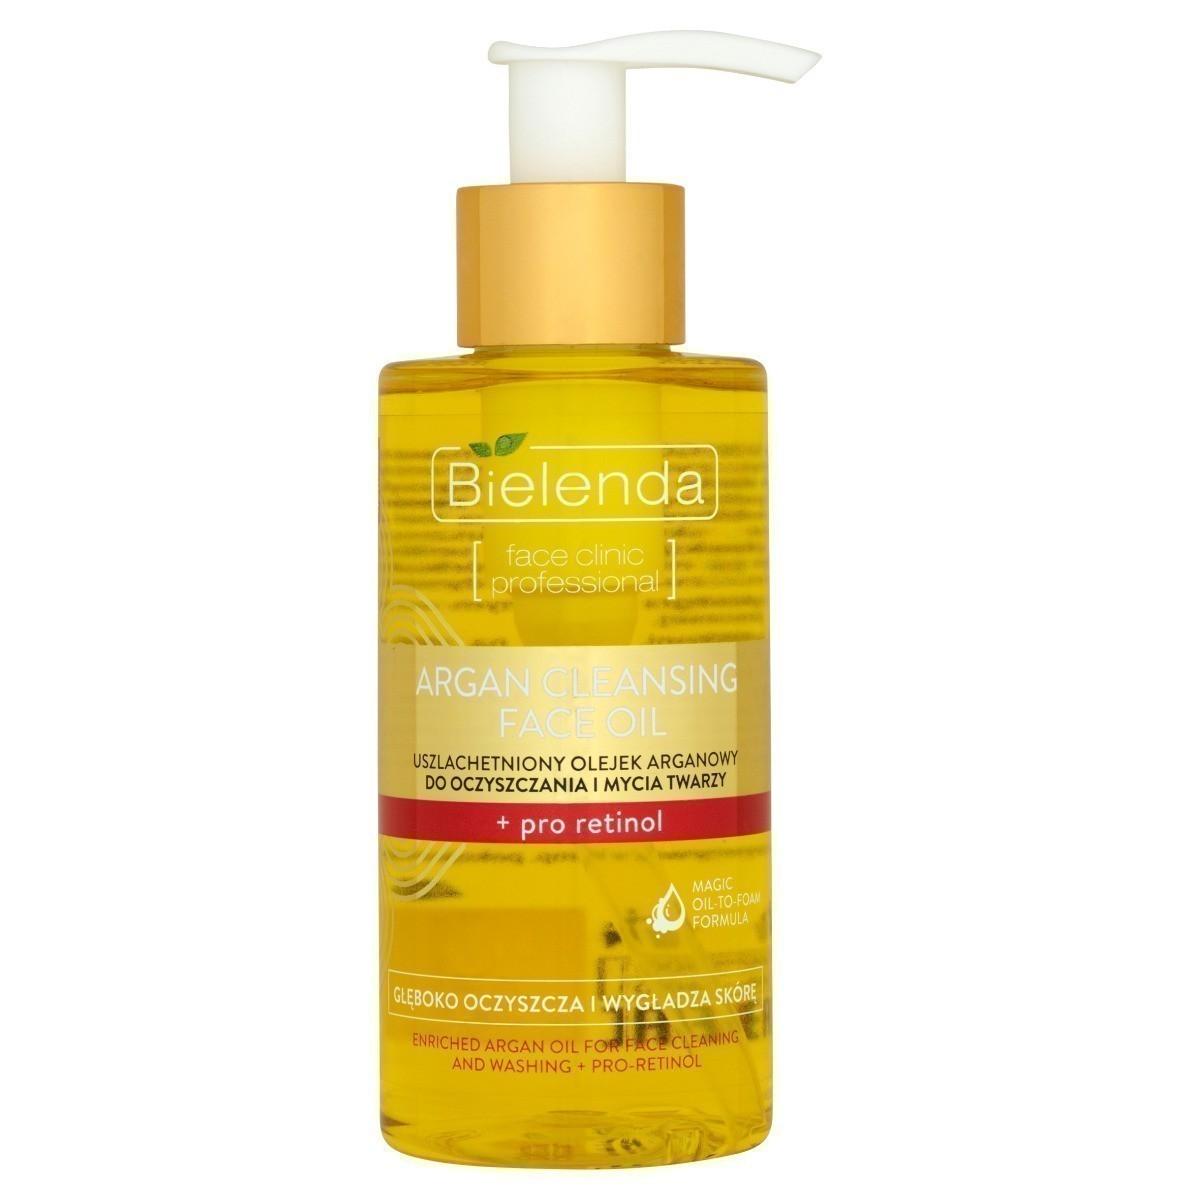 Bielenda Argan Cleansing Face Oil